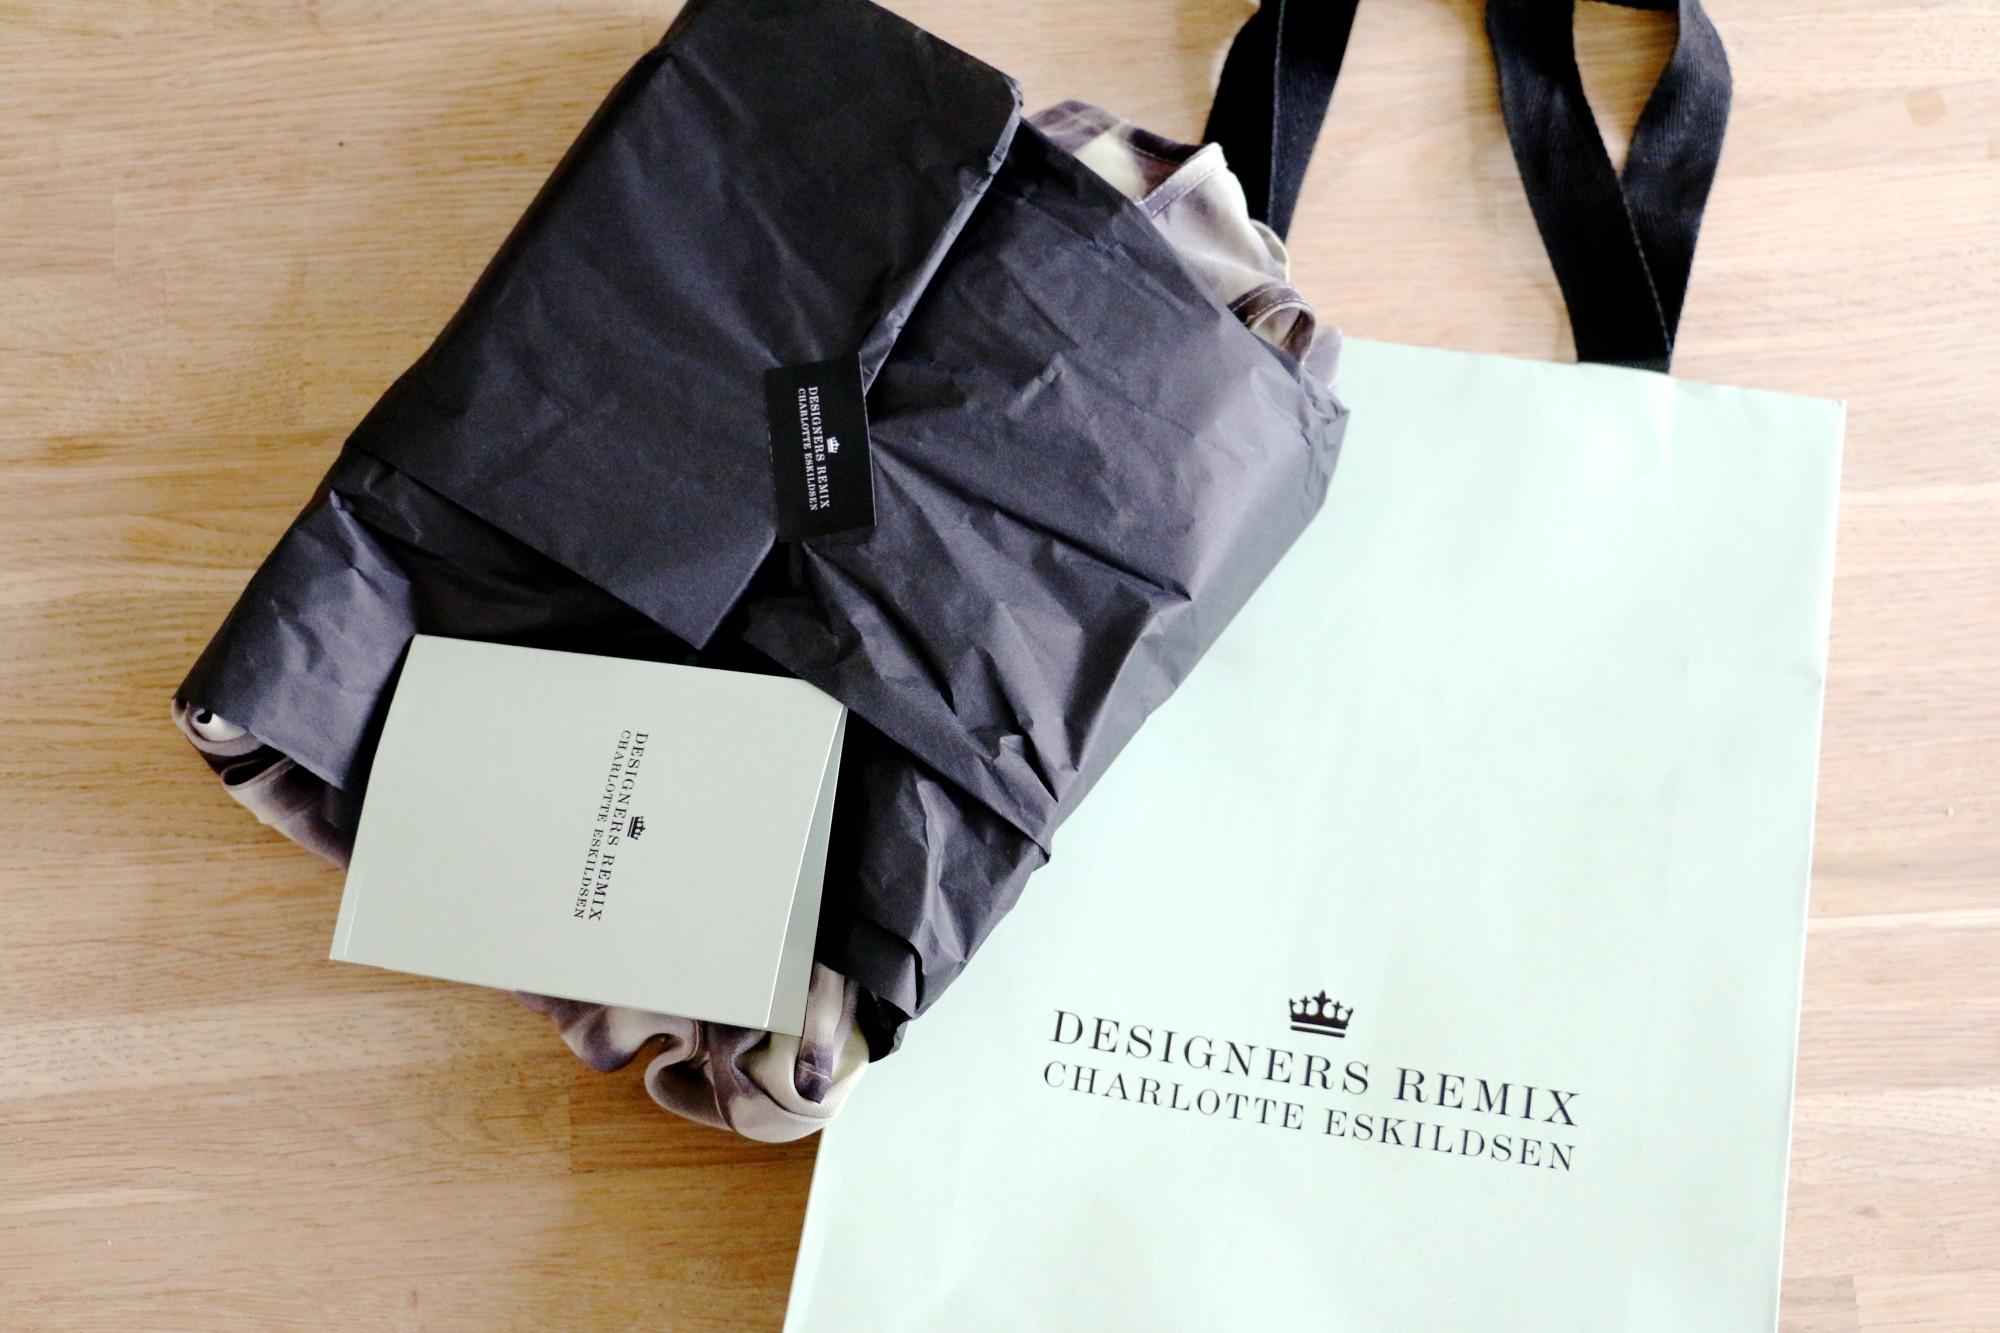 Designers_remix_service